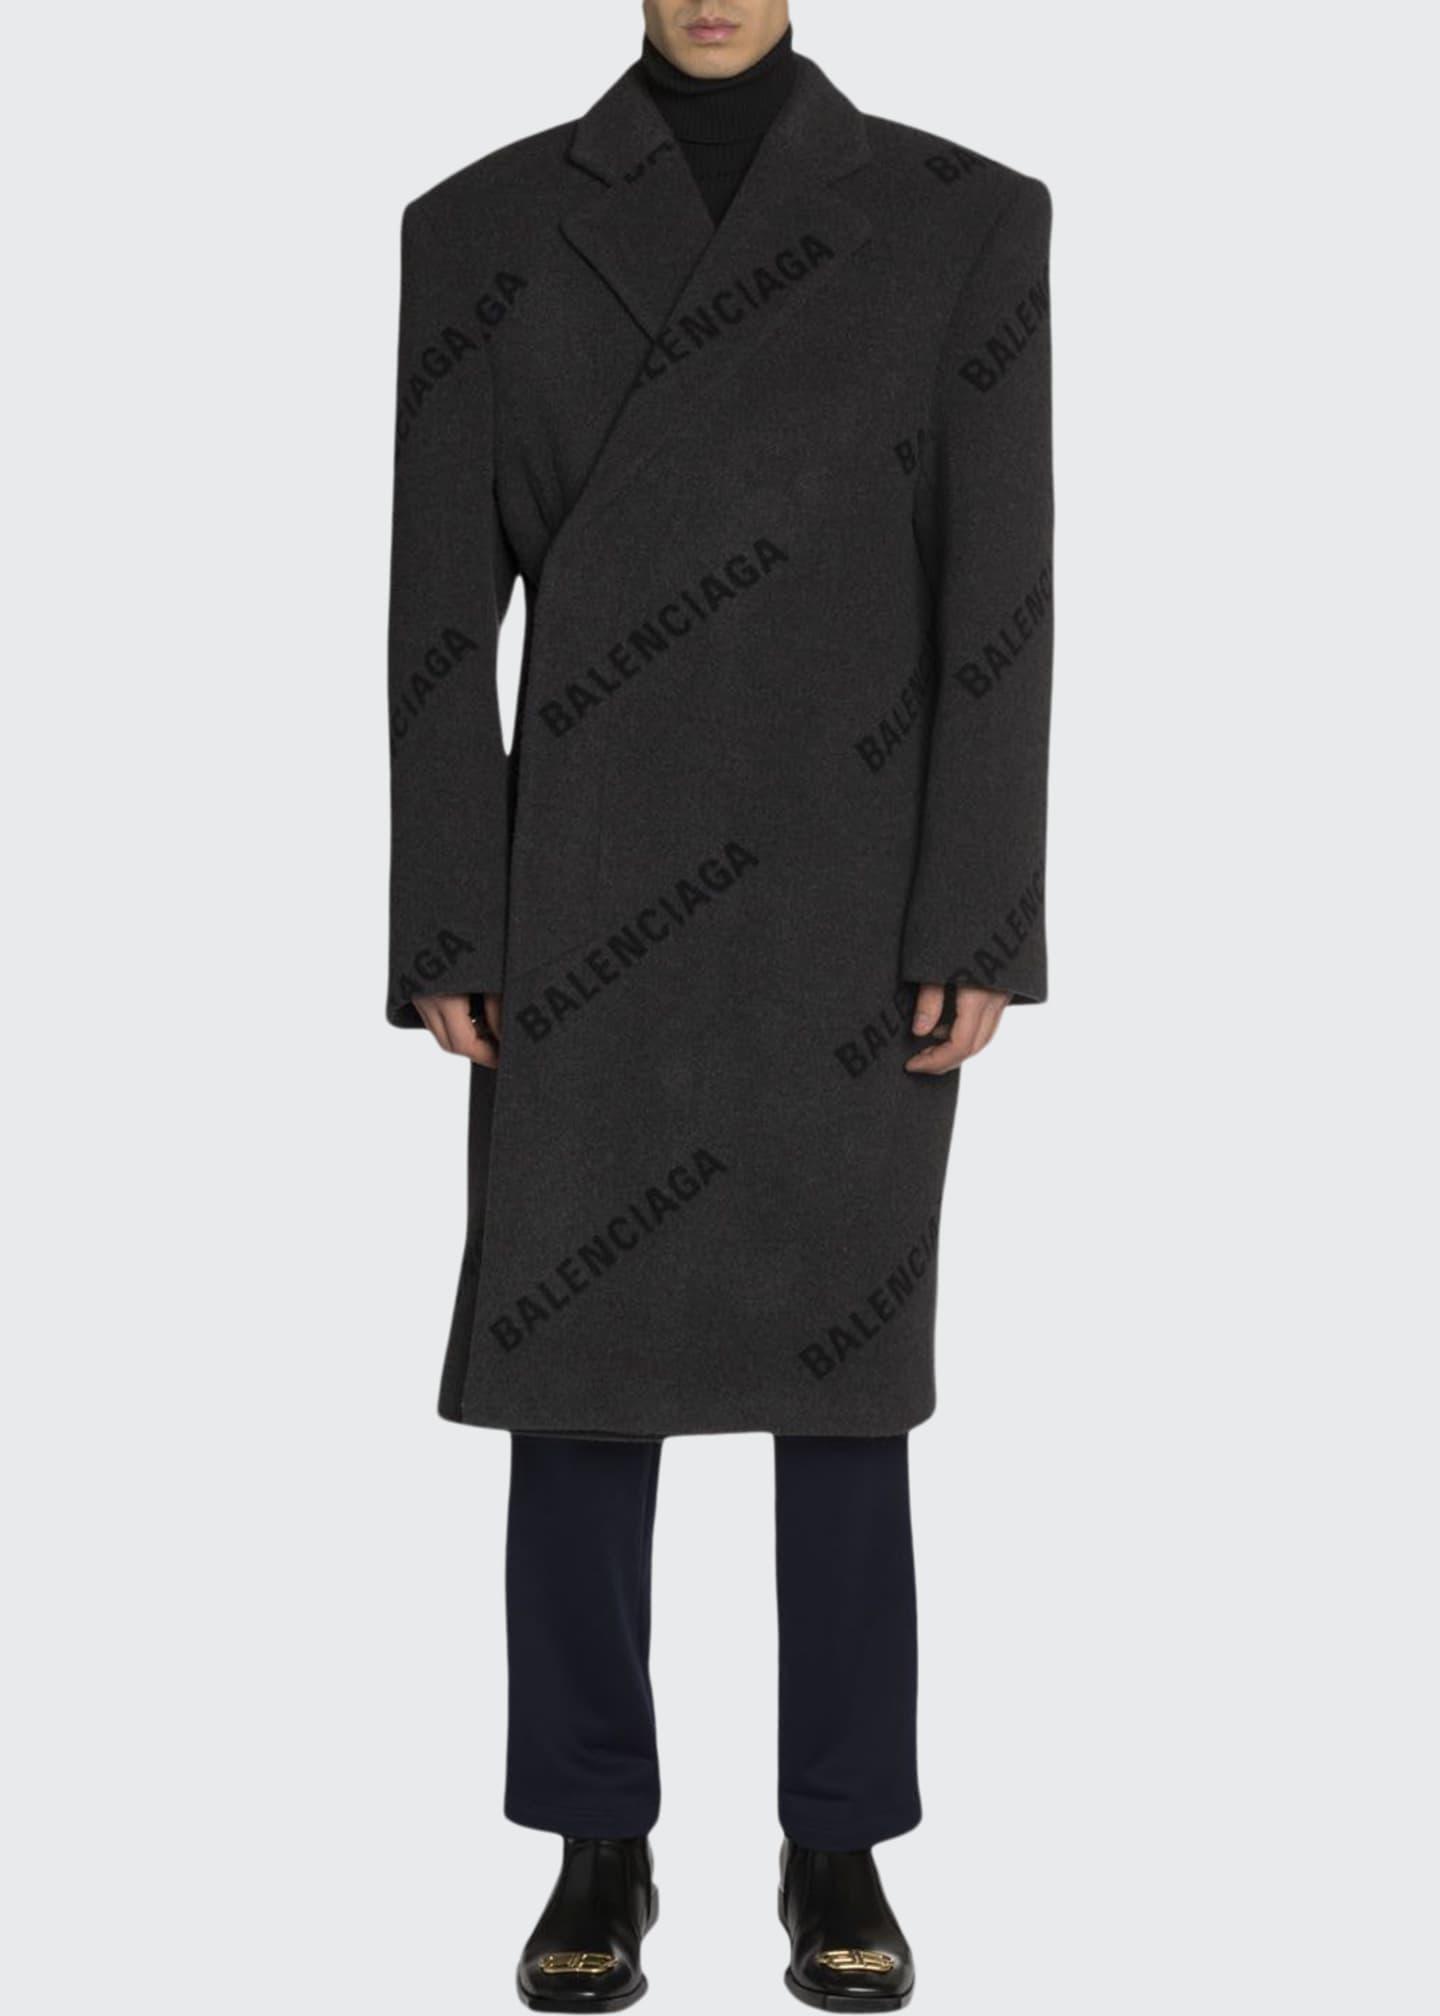 Balenciaga Men's Cashmere Intarsia Logo Shift Overcoat